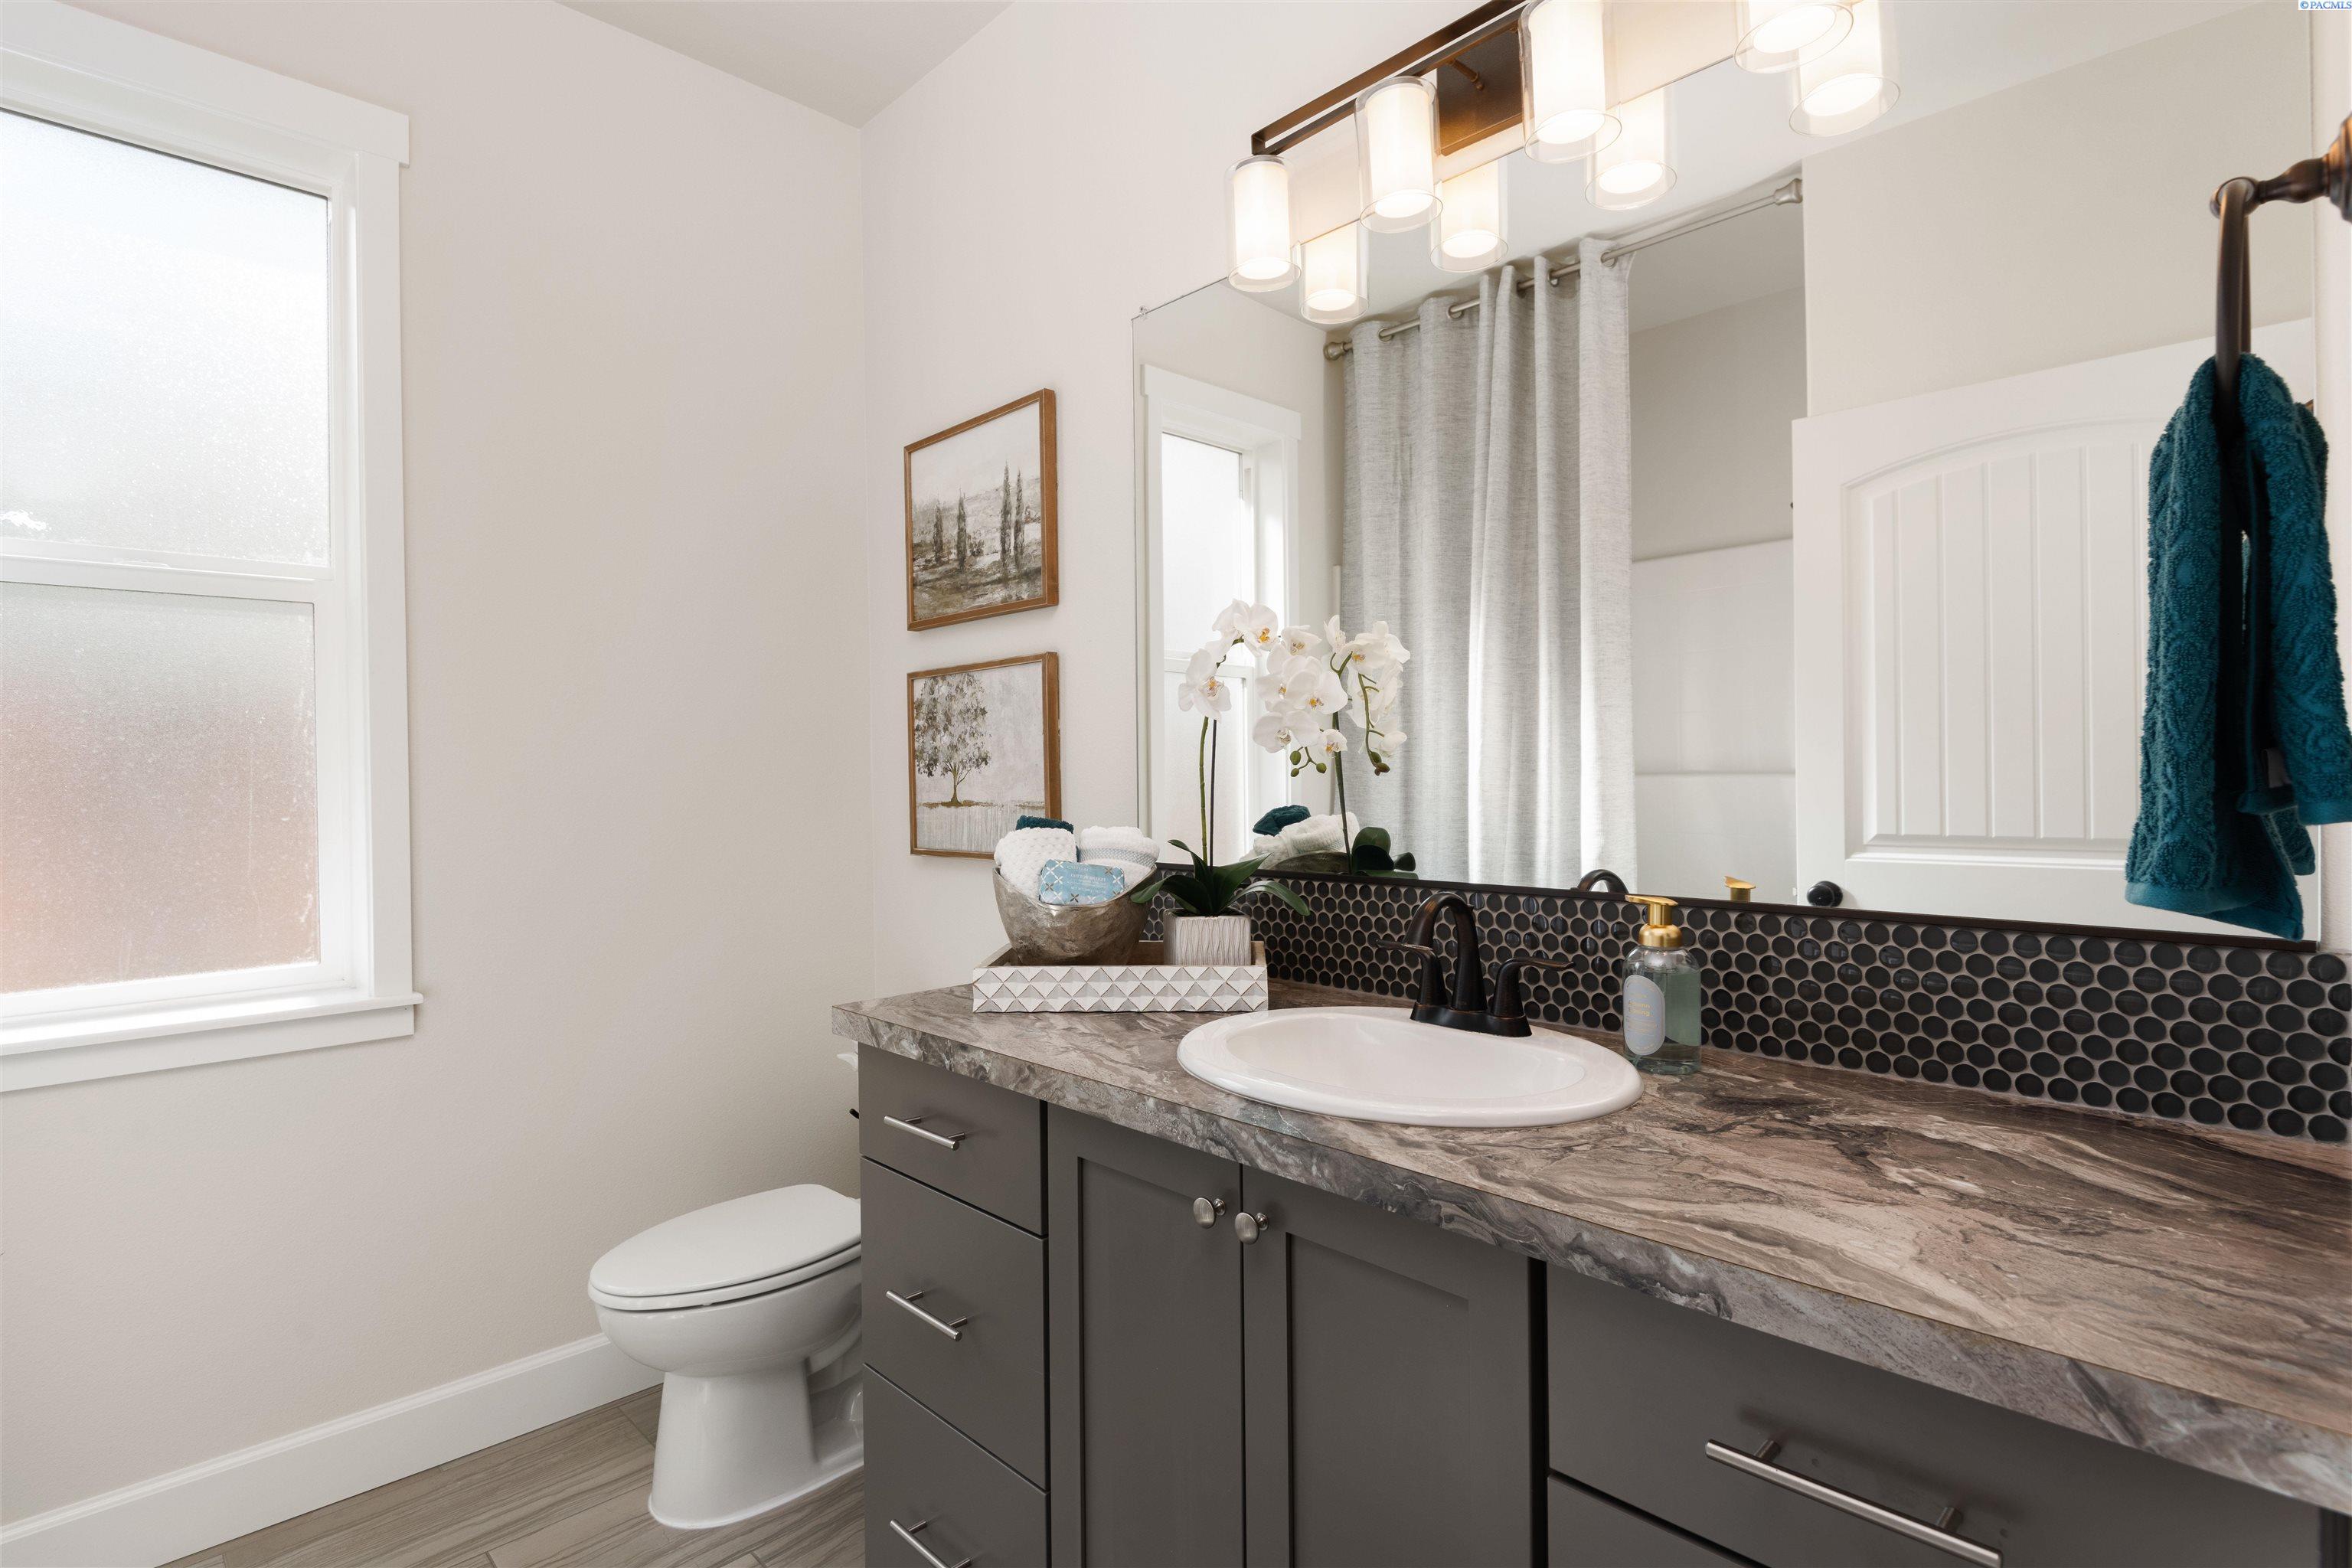 Additional photo for property listing at 6930 W 31st Avenue Kennewick, Washington 99338 United States